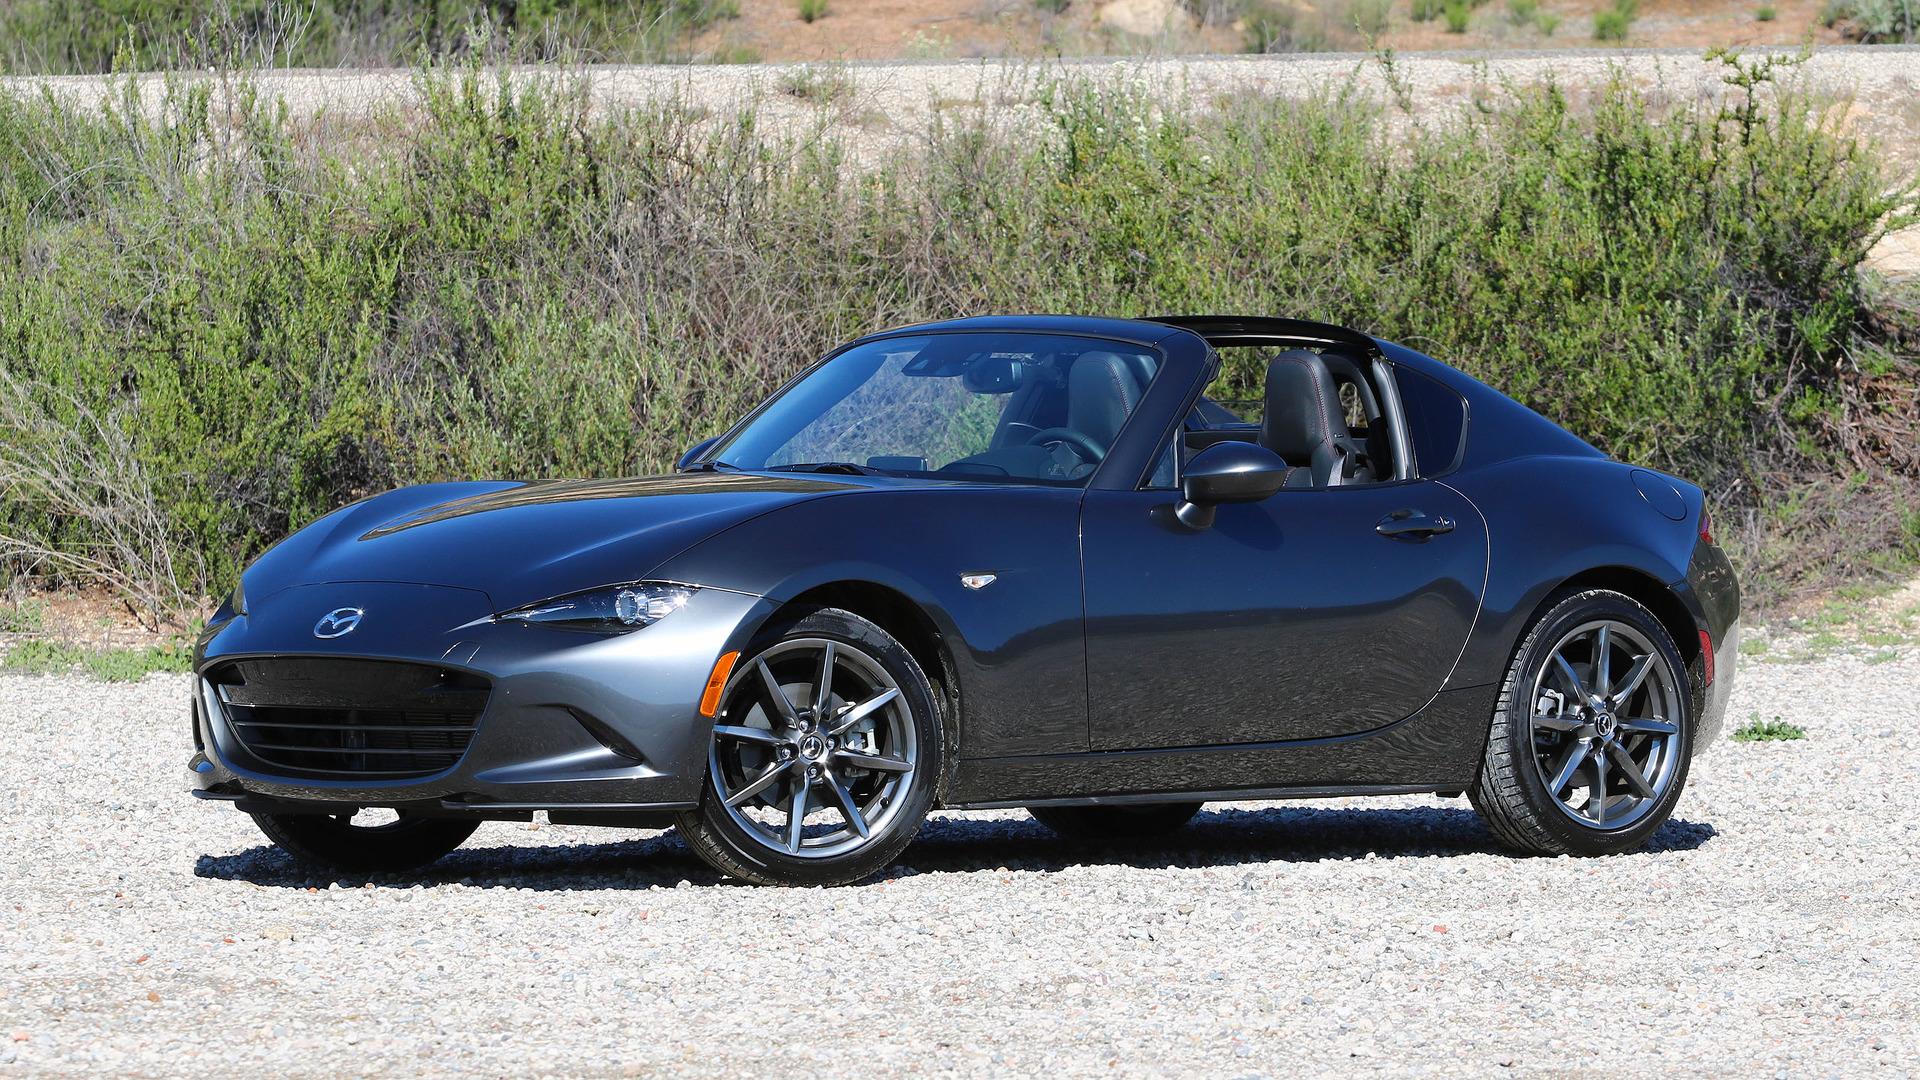 Mazda Miata Gets Heavily Updated, 182-HP Engine In Japan